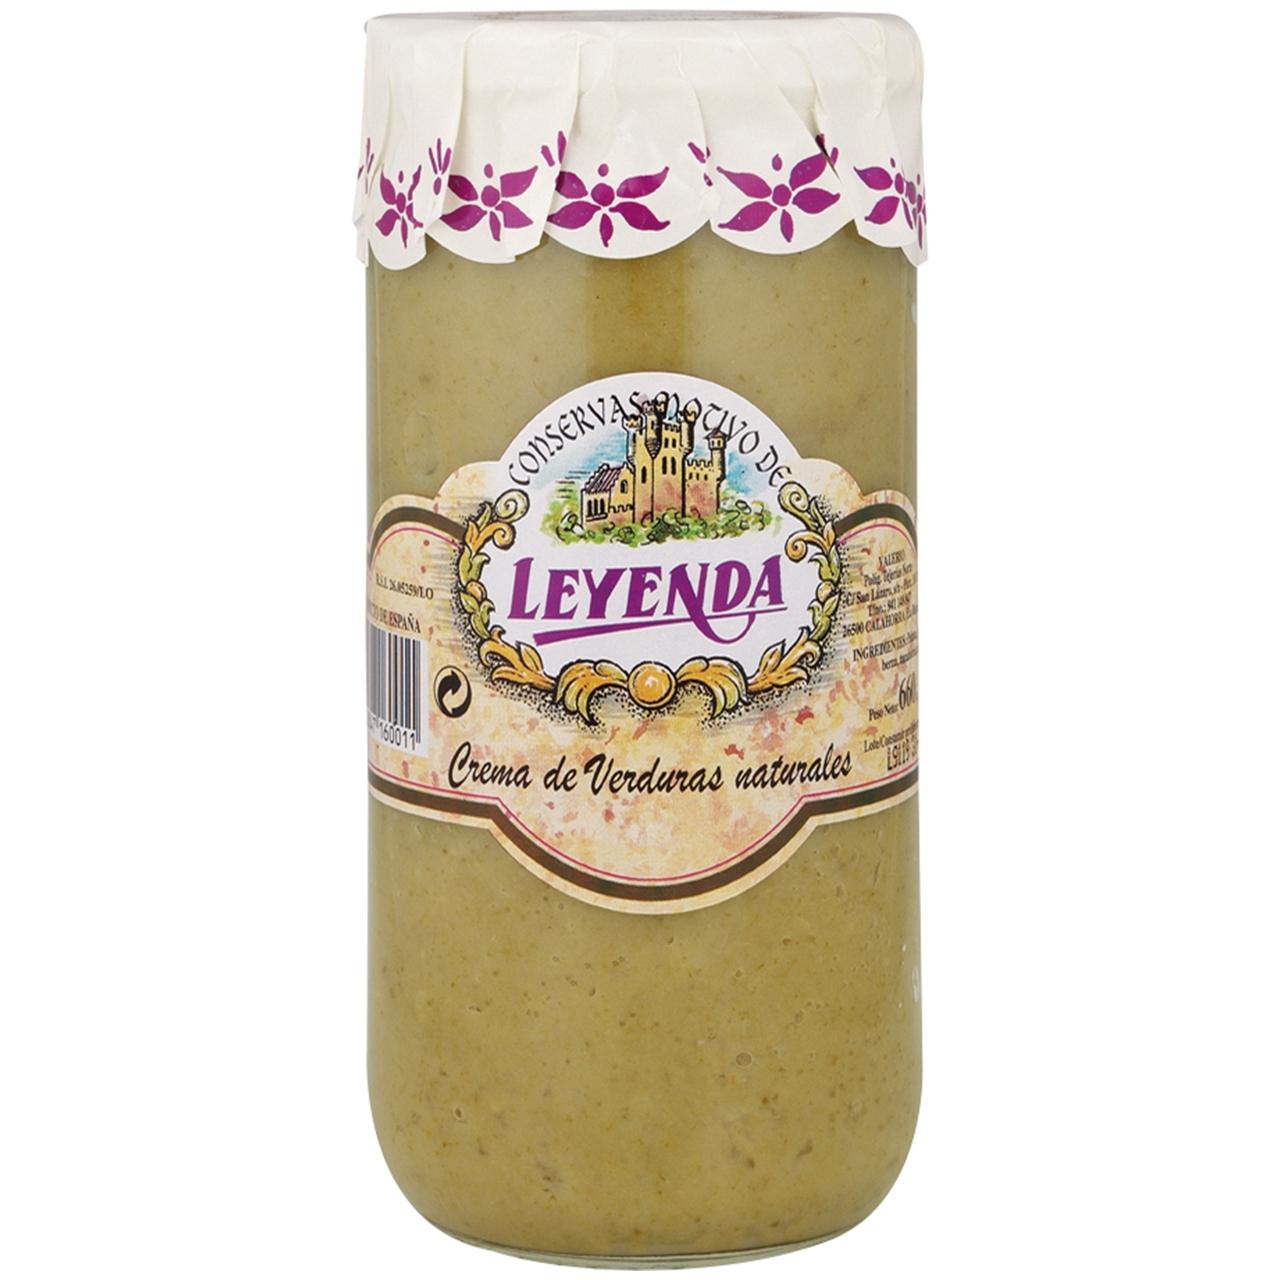 Crema de verdures natural 720ml. Leyenda